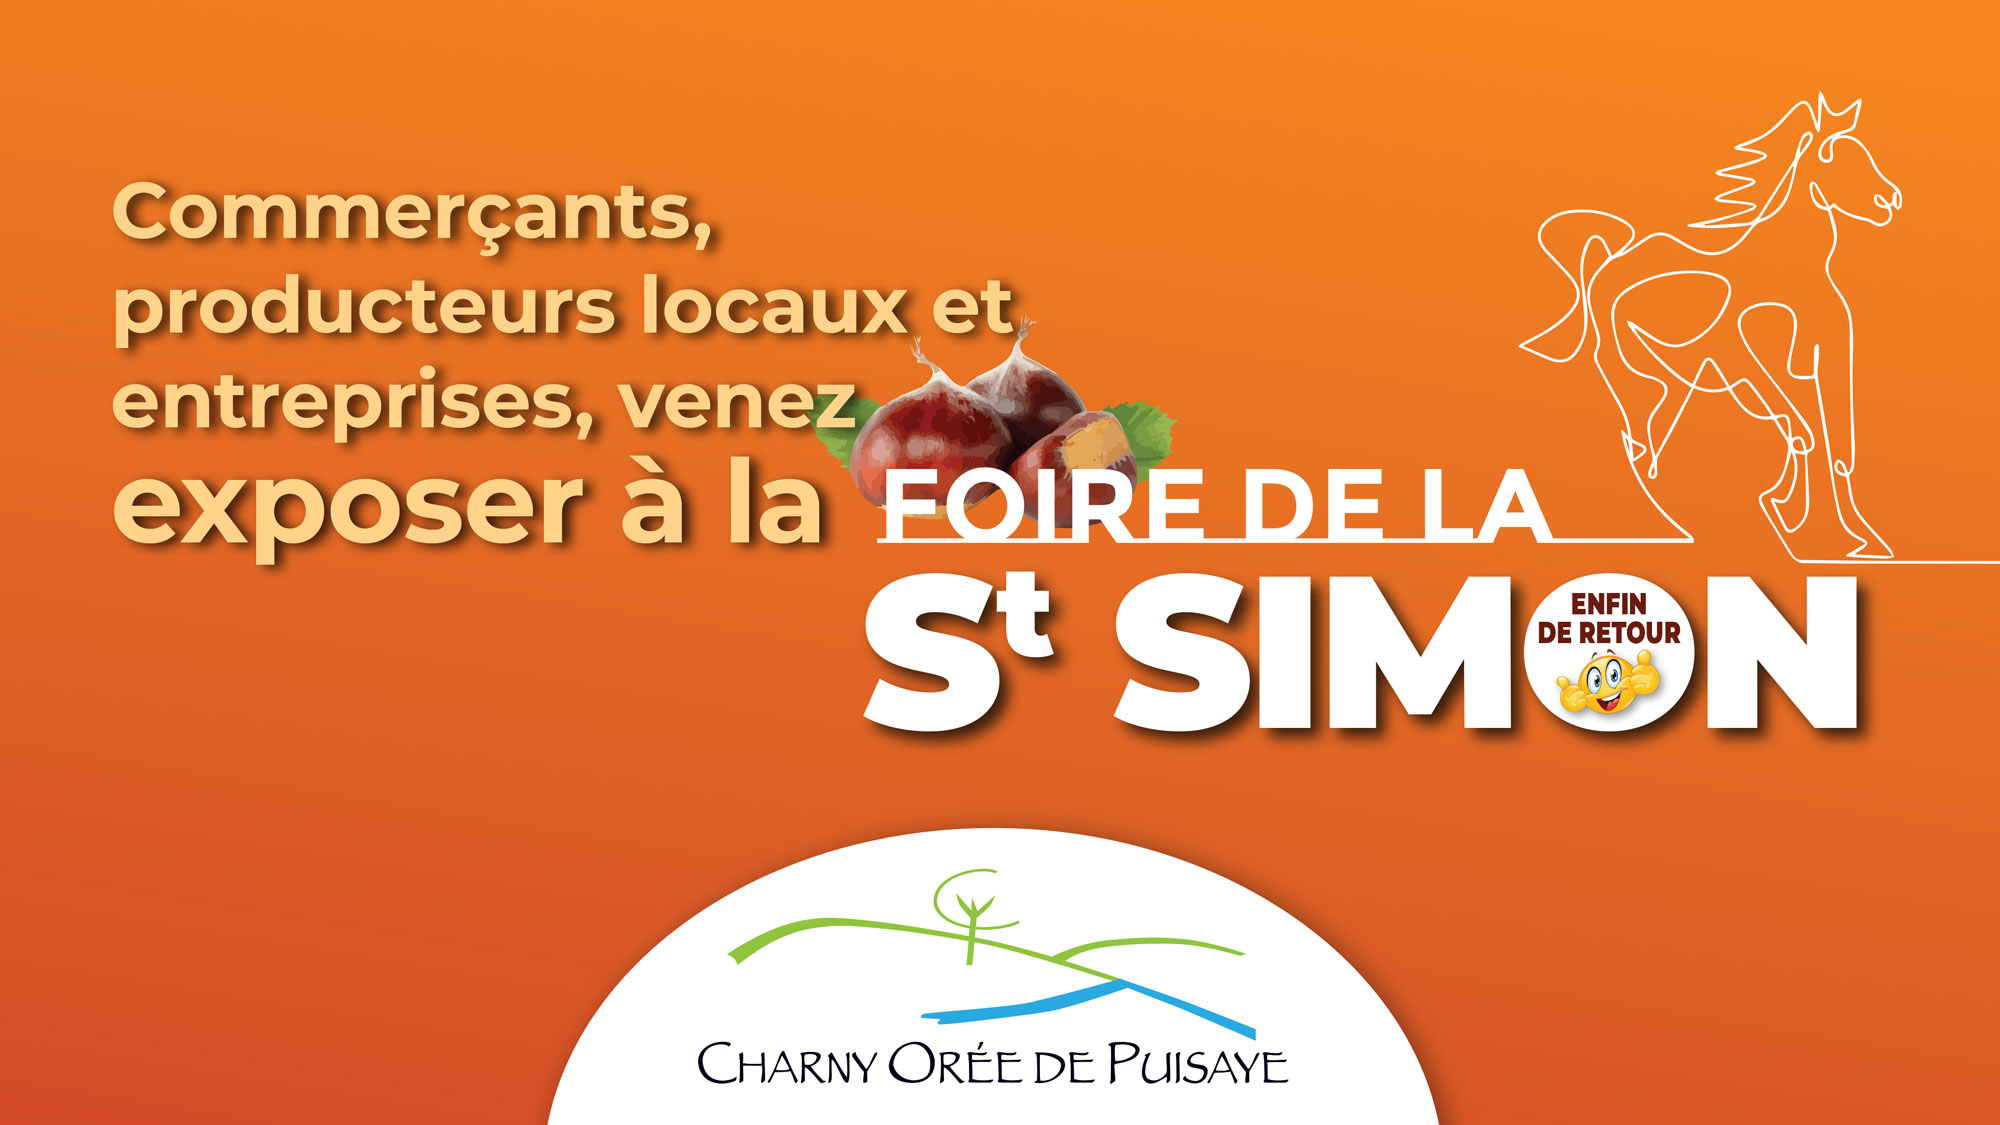 St Simon Foire exposants Charny Orée de Puisaye